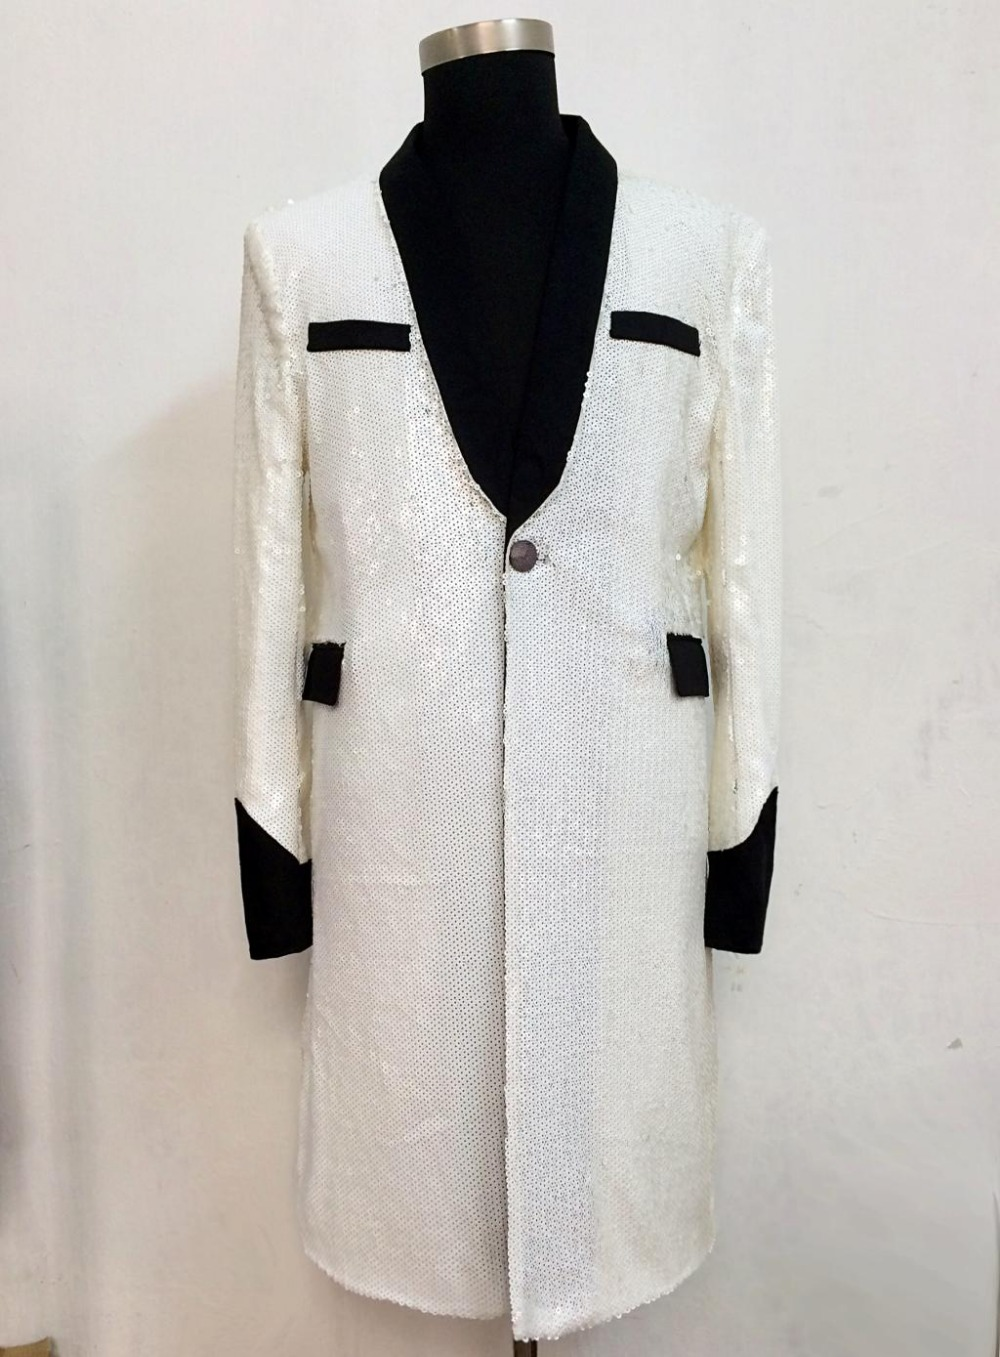 Bigbang GD Men Singers Stage Show Sequins Splice Long Style Slim Suit Jacket Costumes Male Paillette Formal Dress !